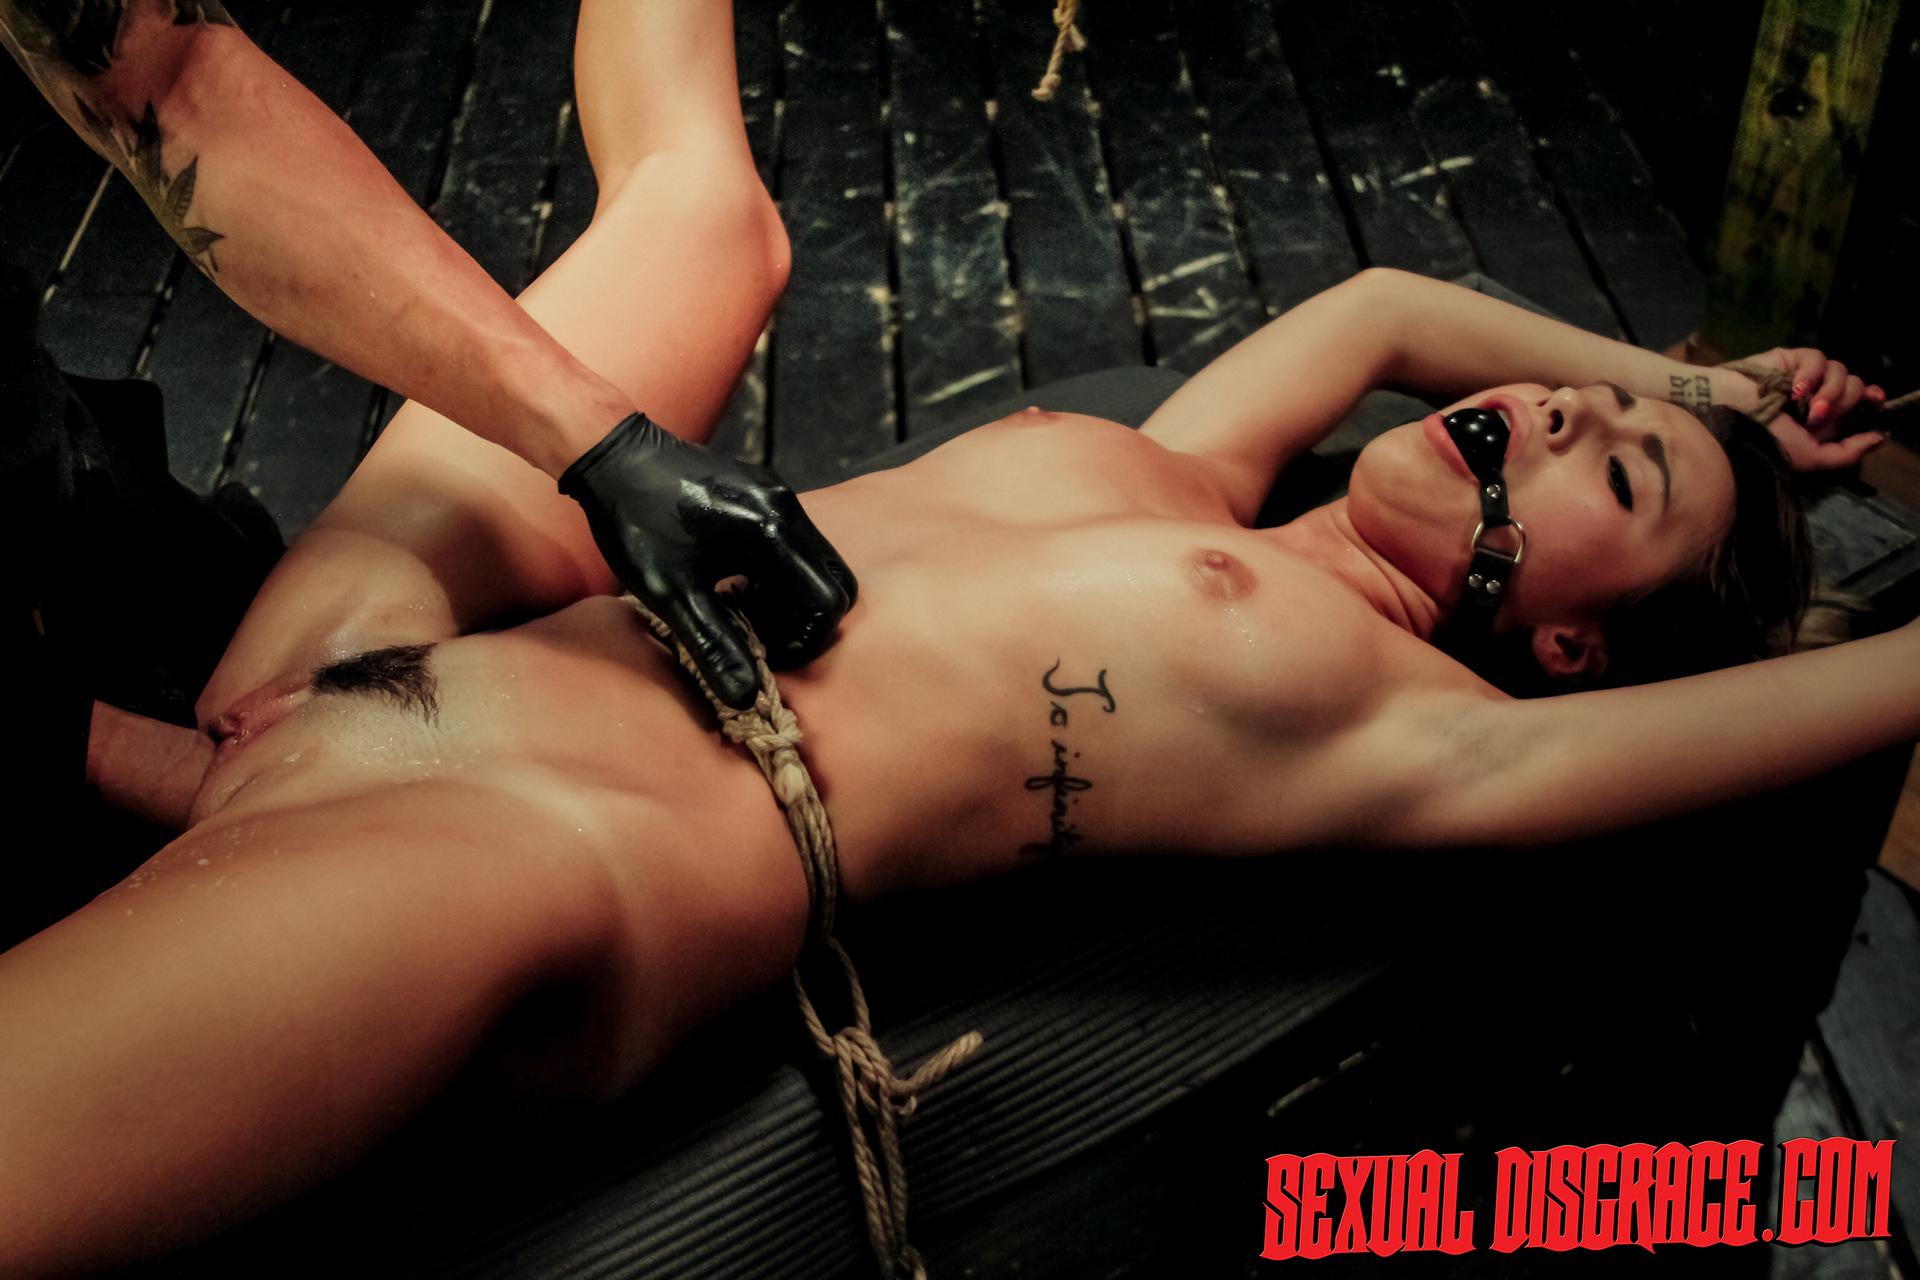 Marina Suffers Wire Restrain Bondage, Inhale Bj, Raunchy Orgy, Splashing, Spunk Facial Cumshot